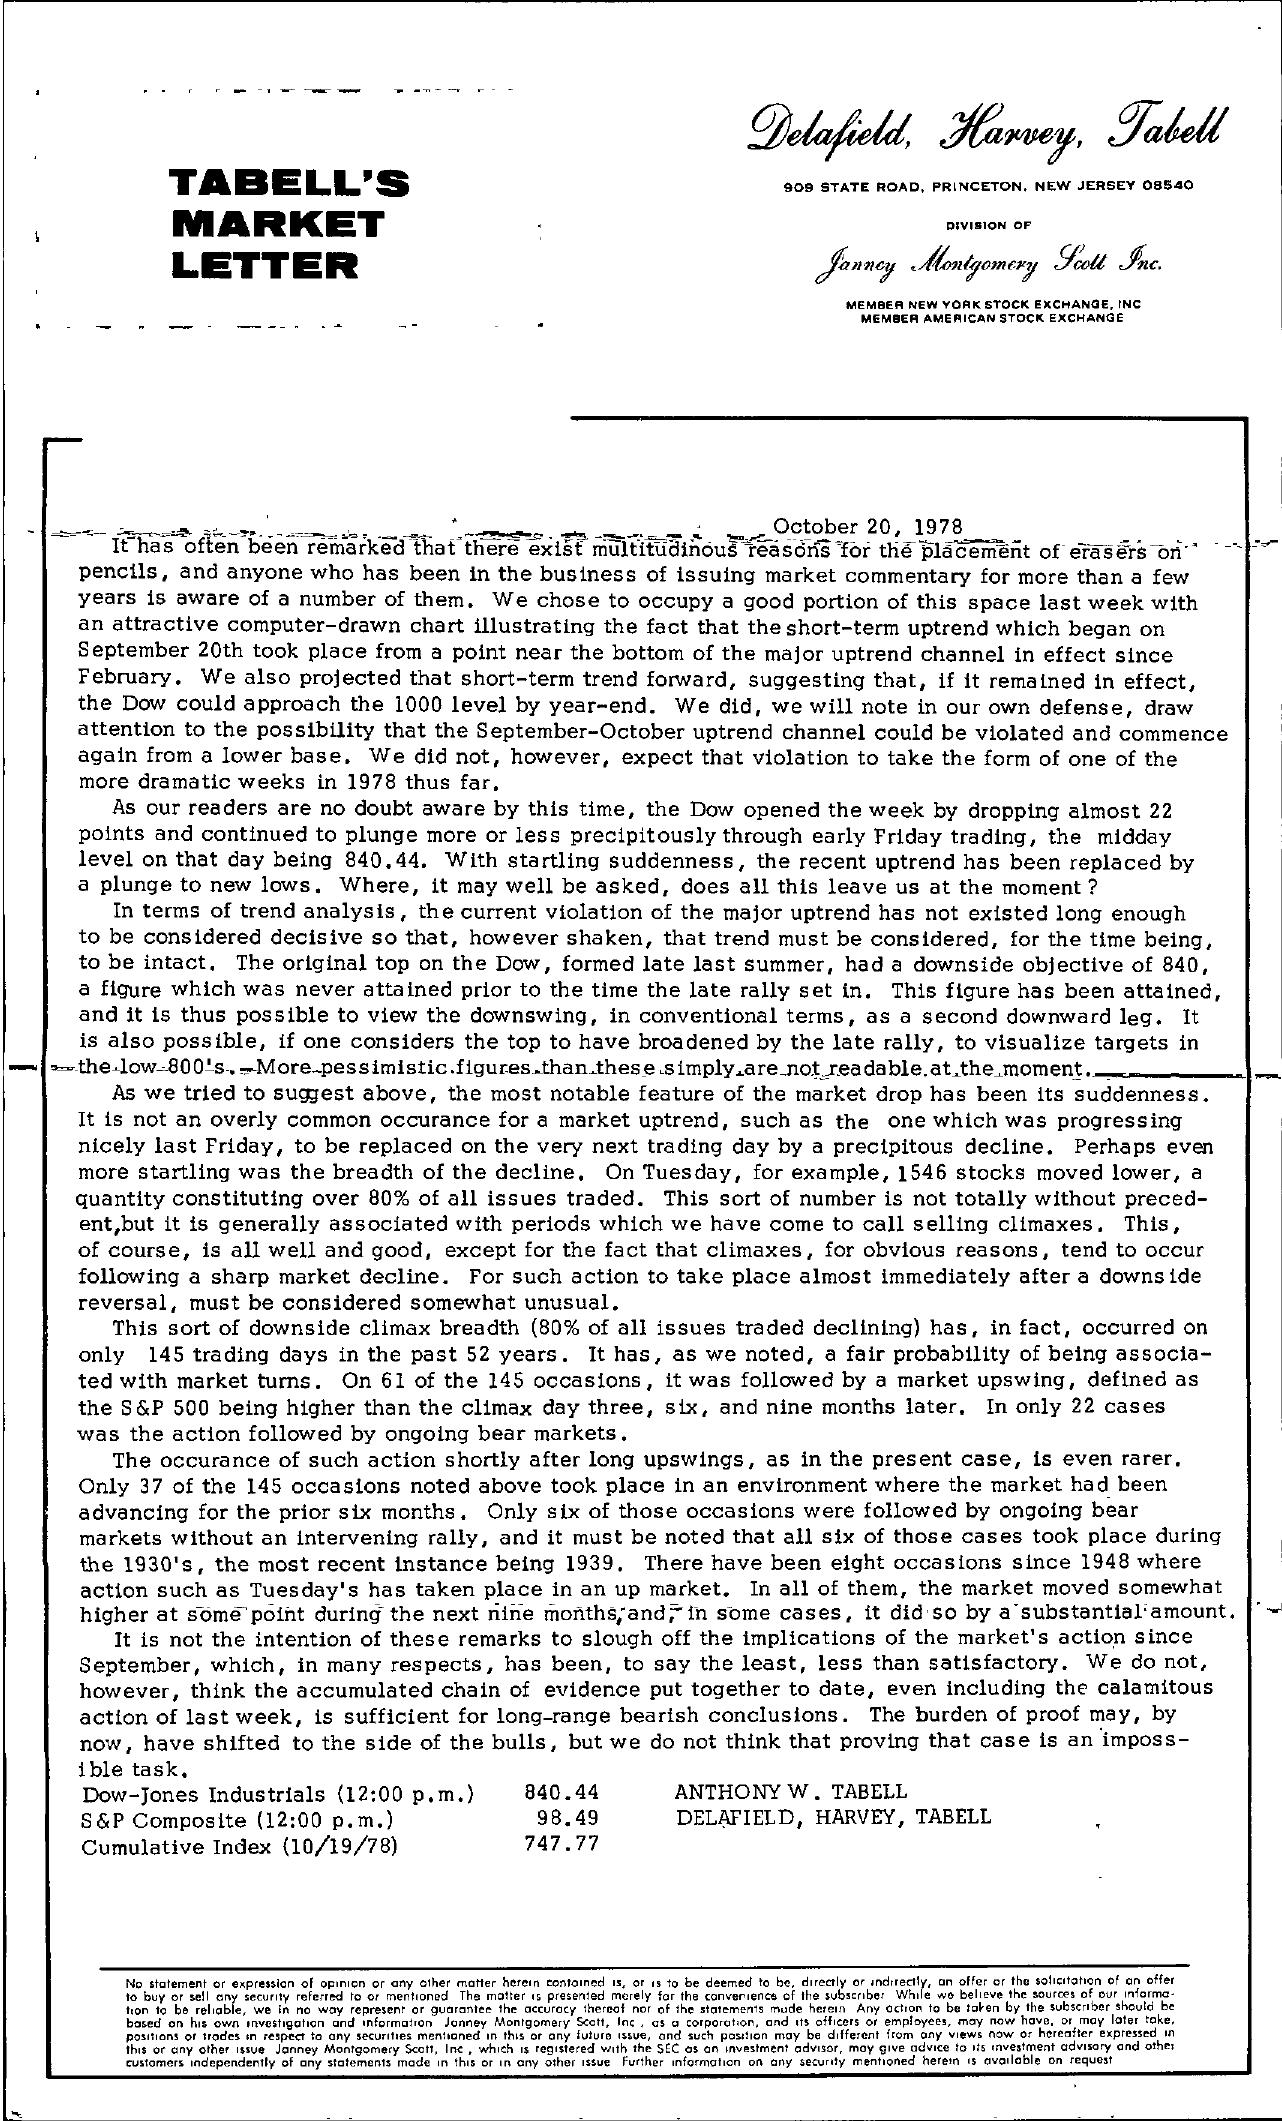 Tabell's Market Letter - October 20, 1978